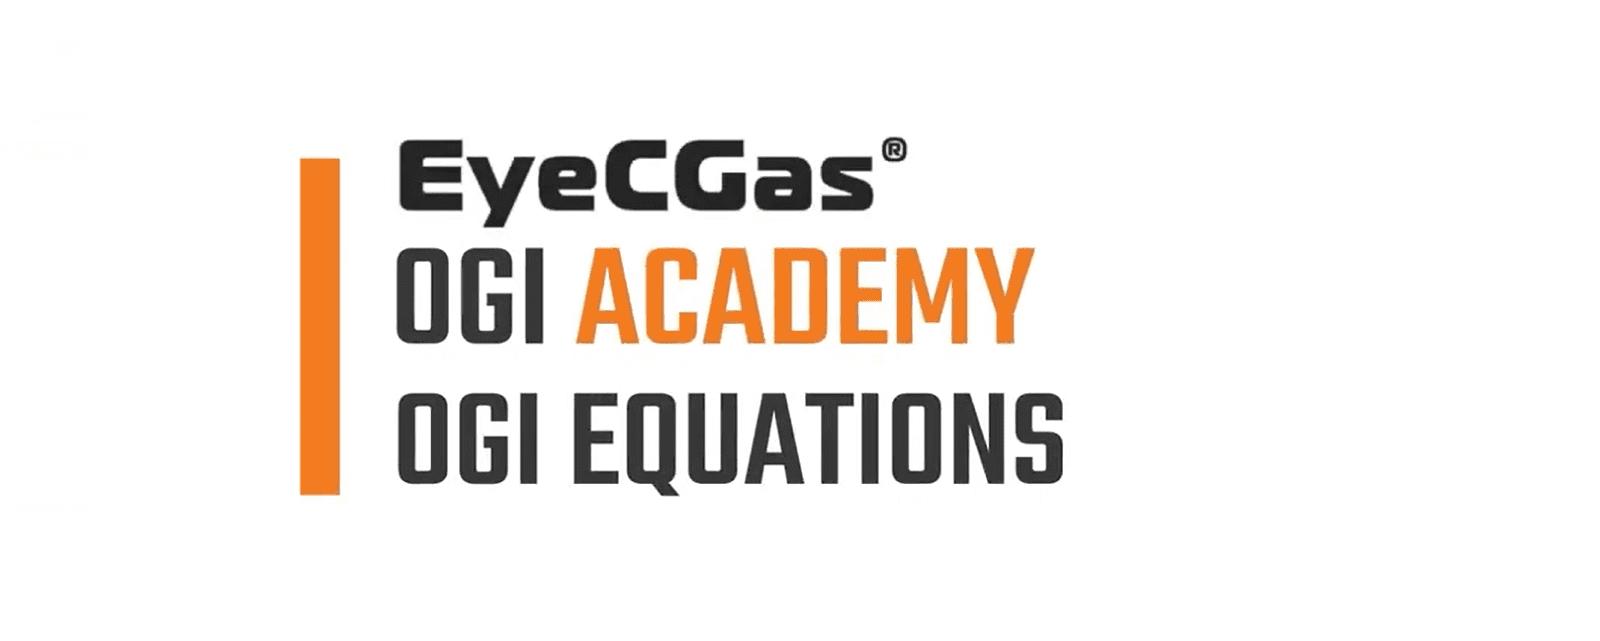 Opgal OGI Academy – Equations